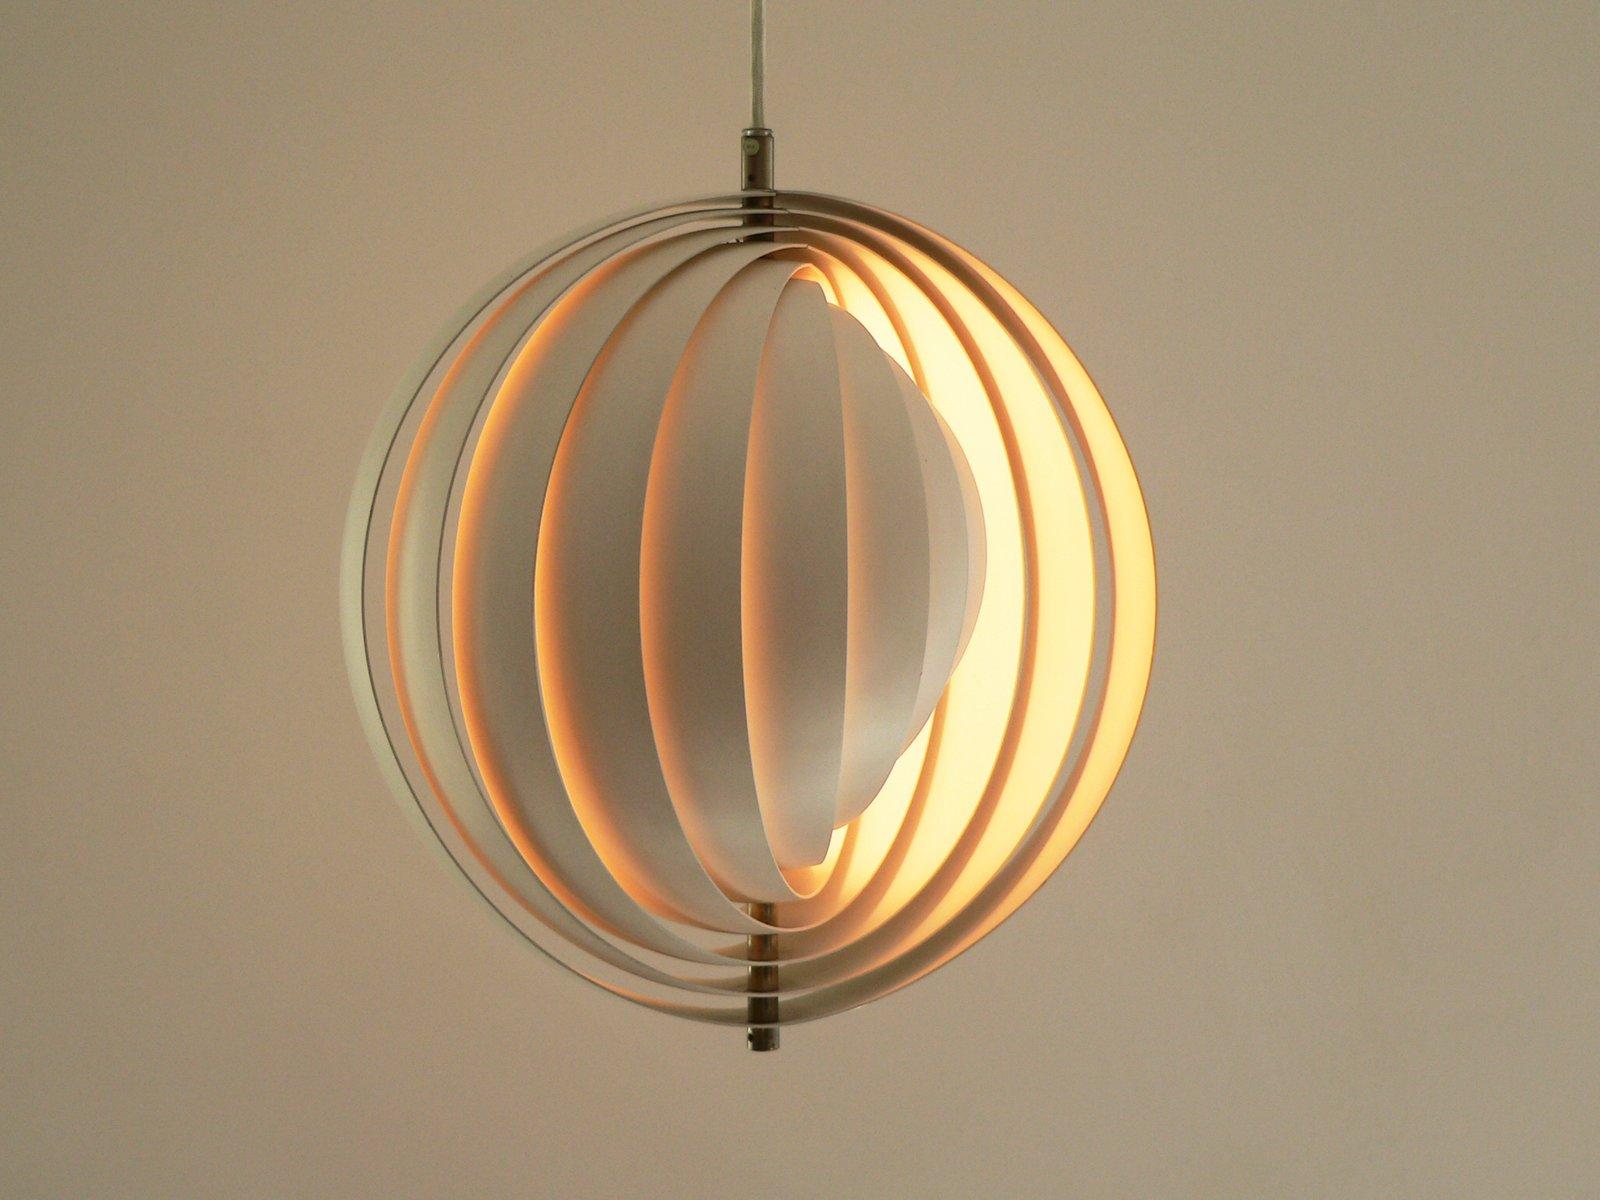 moon lampe von verner panton f r louis poulsen 1960er bei pamono kaufen. Black Bedroom Furniture Sets. Home Design Ideas